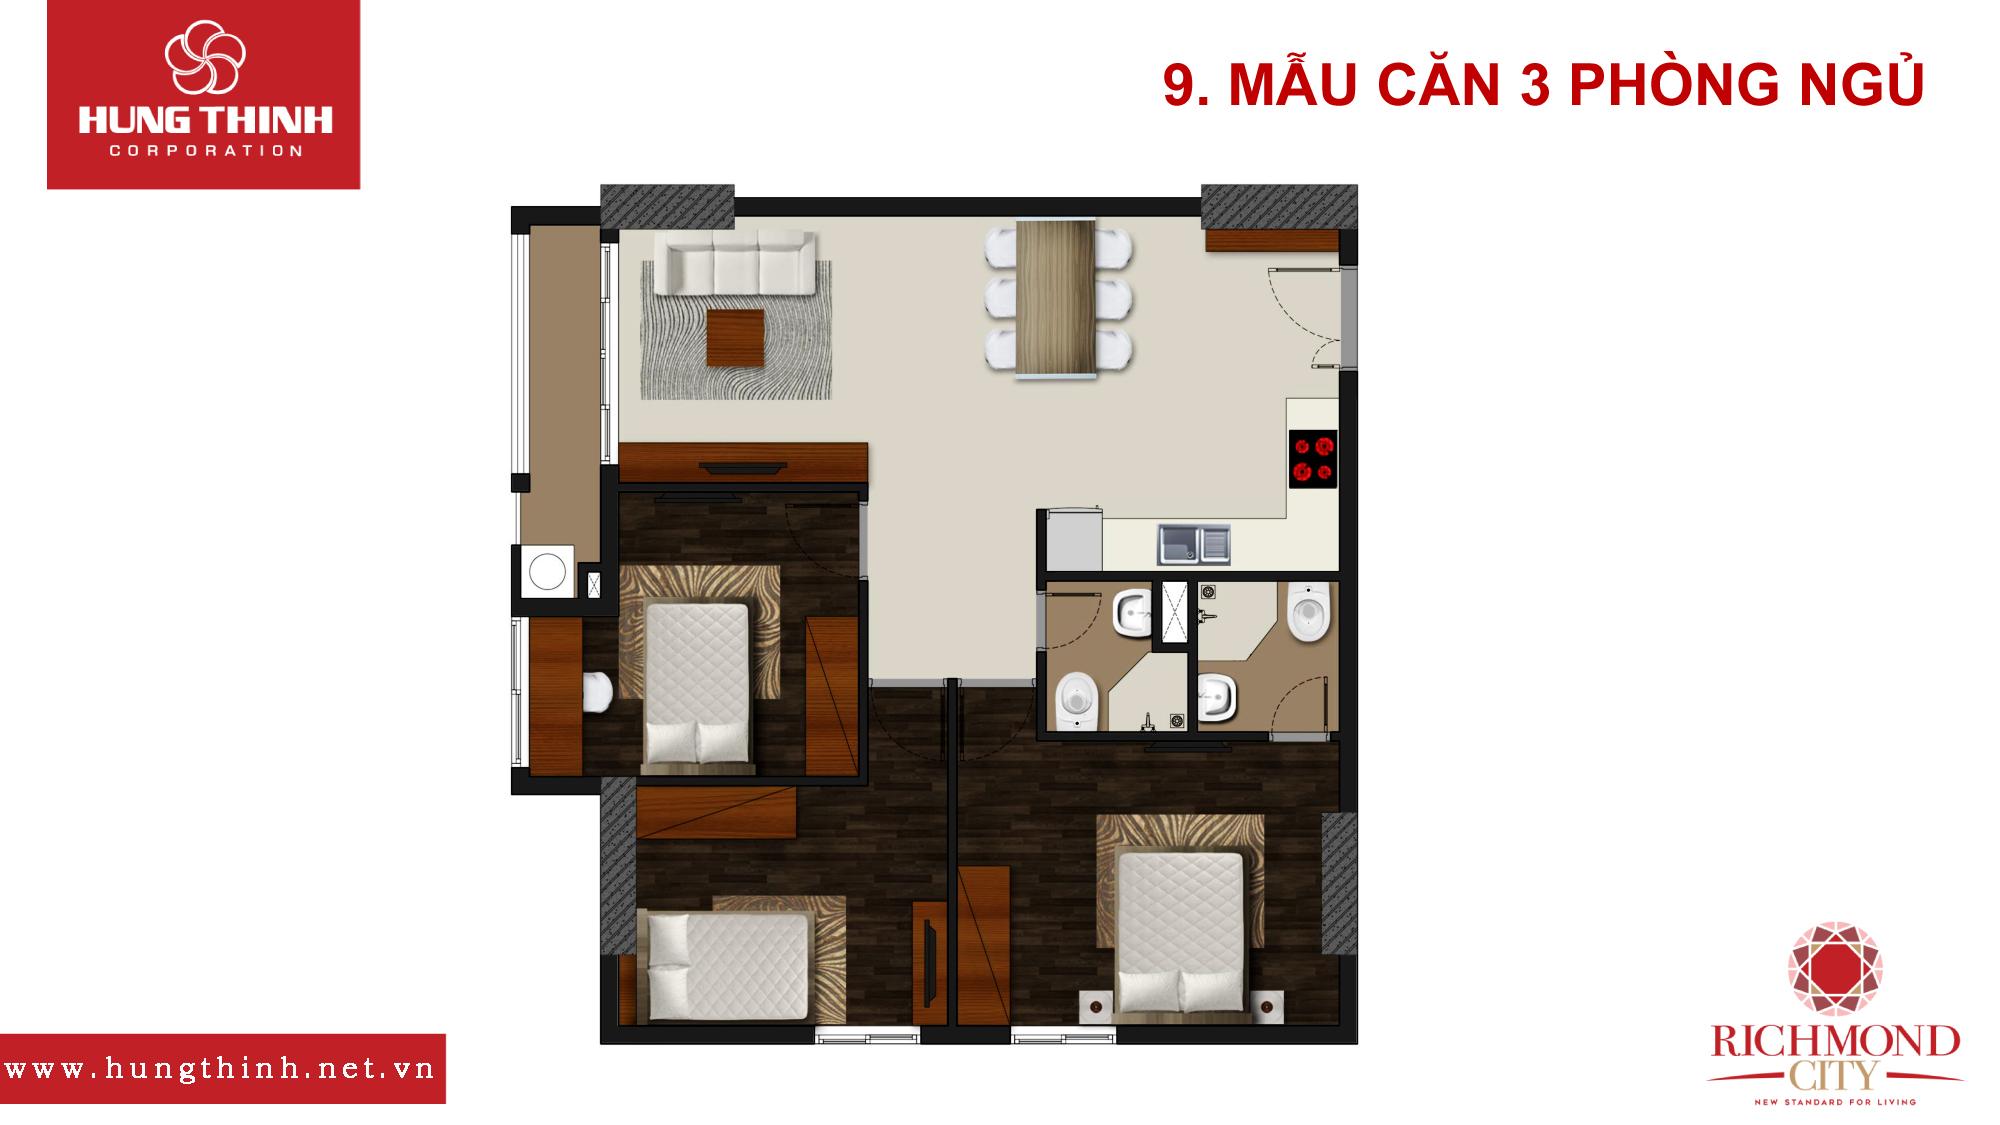 Mẫu căn hộ 3 PN Richmond City